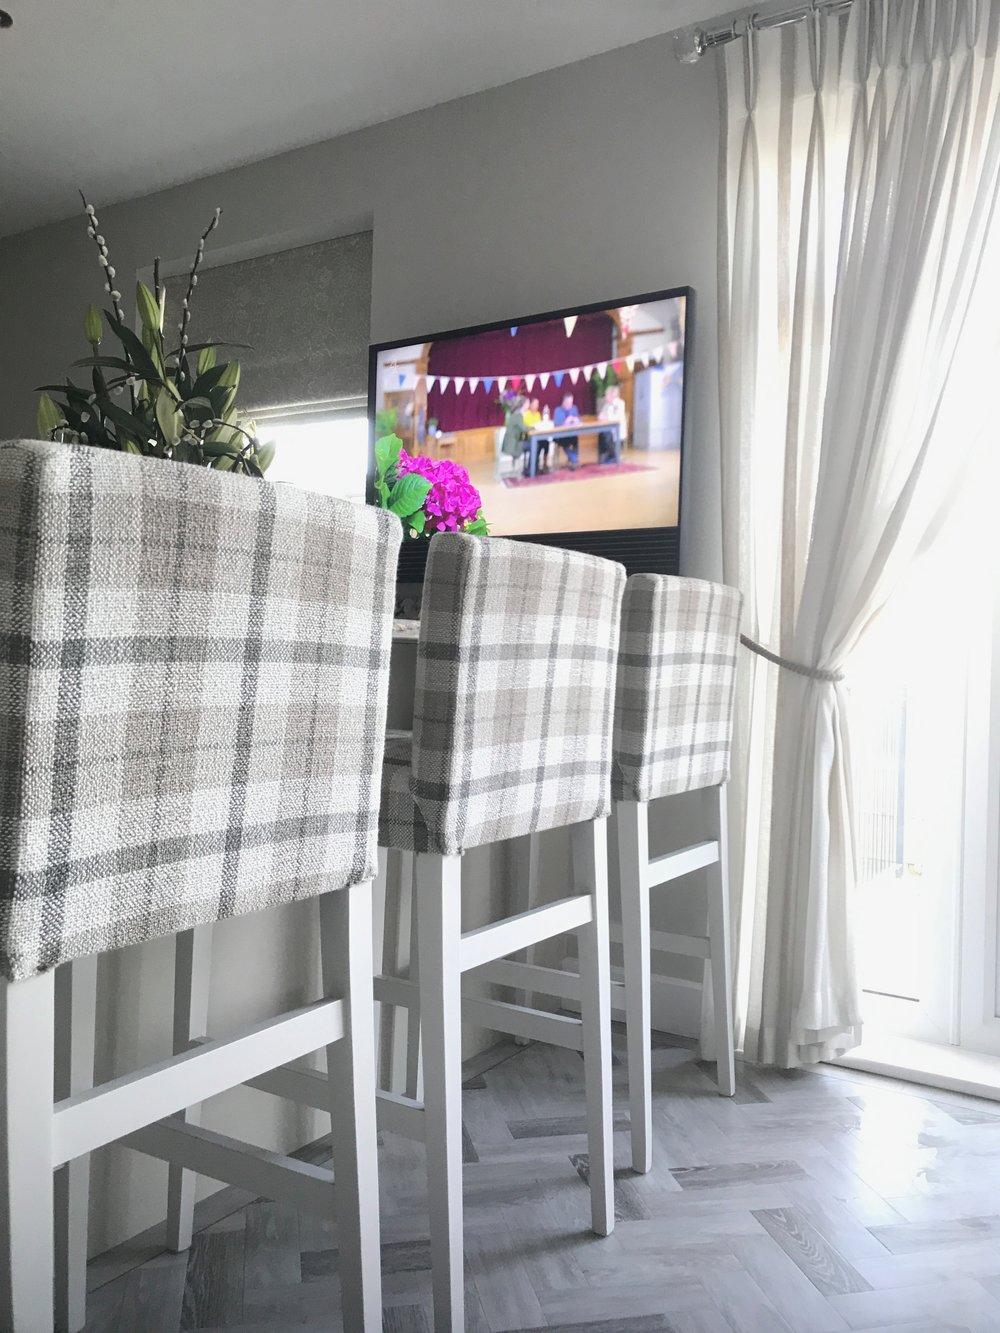 BESPOKE UPHOLSTERED FURNITURE   Individual pieces of upholstered furniture in any size, style or shape